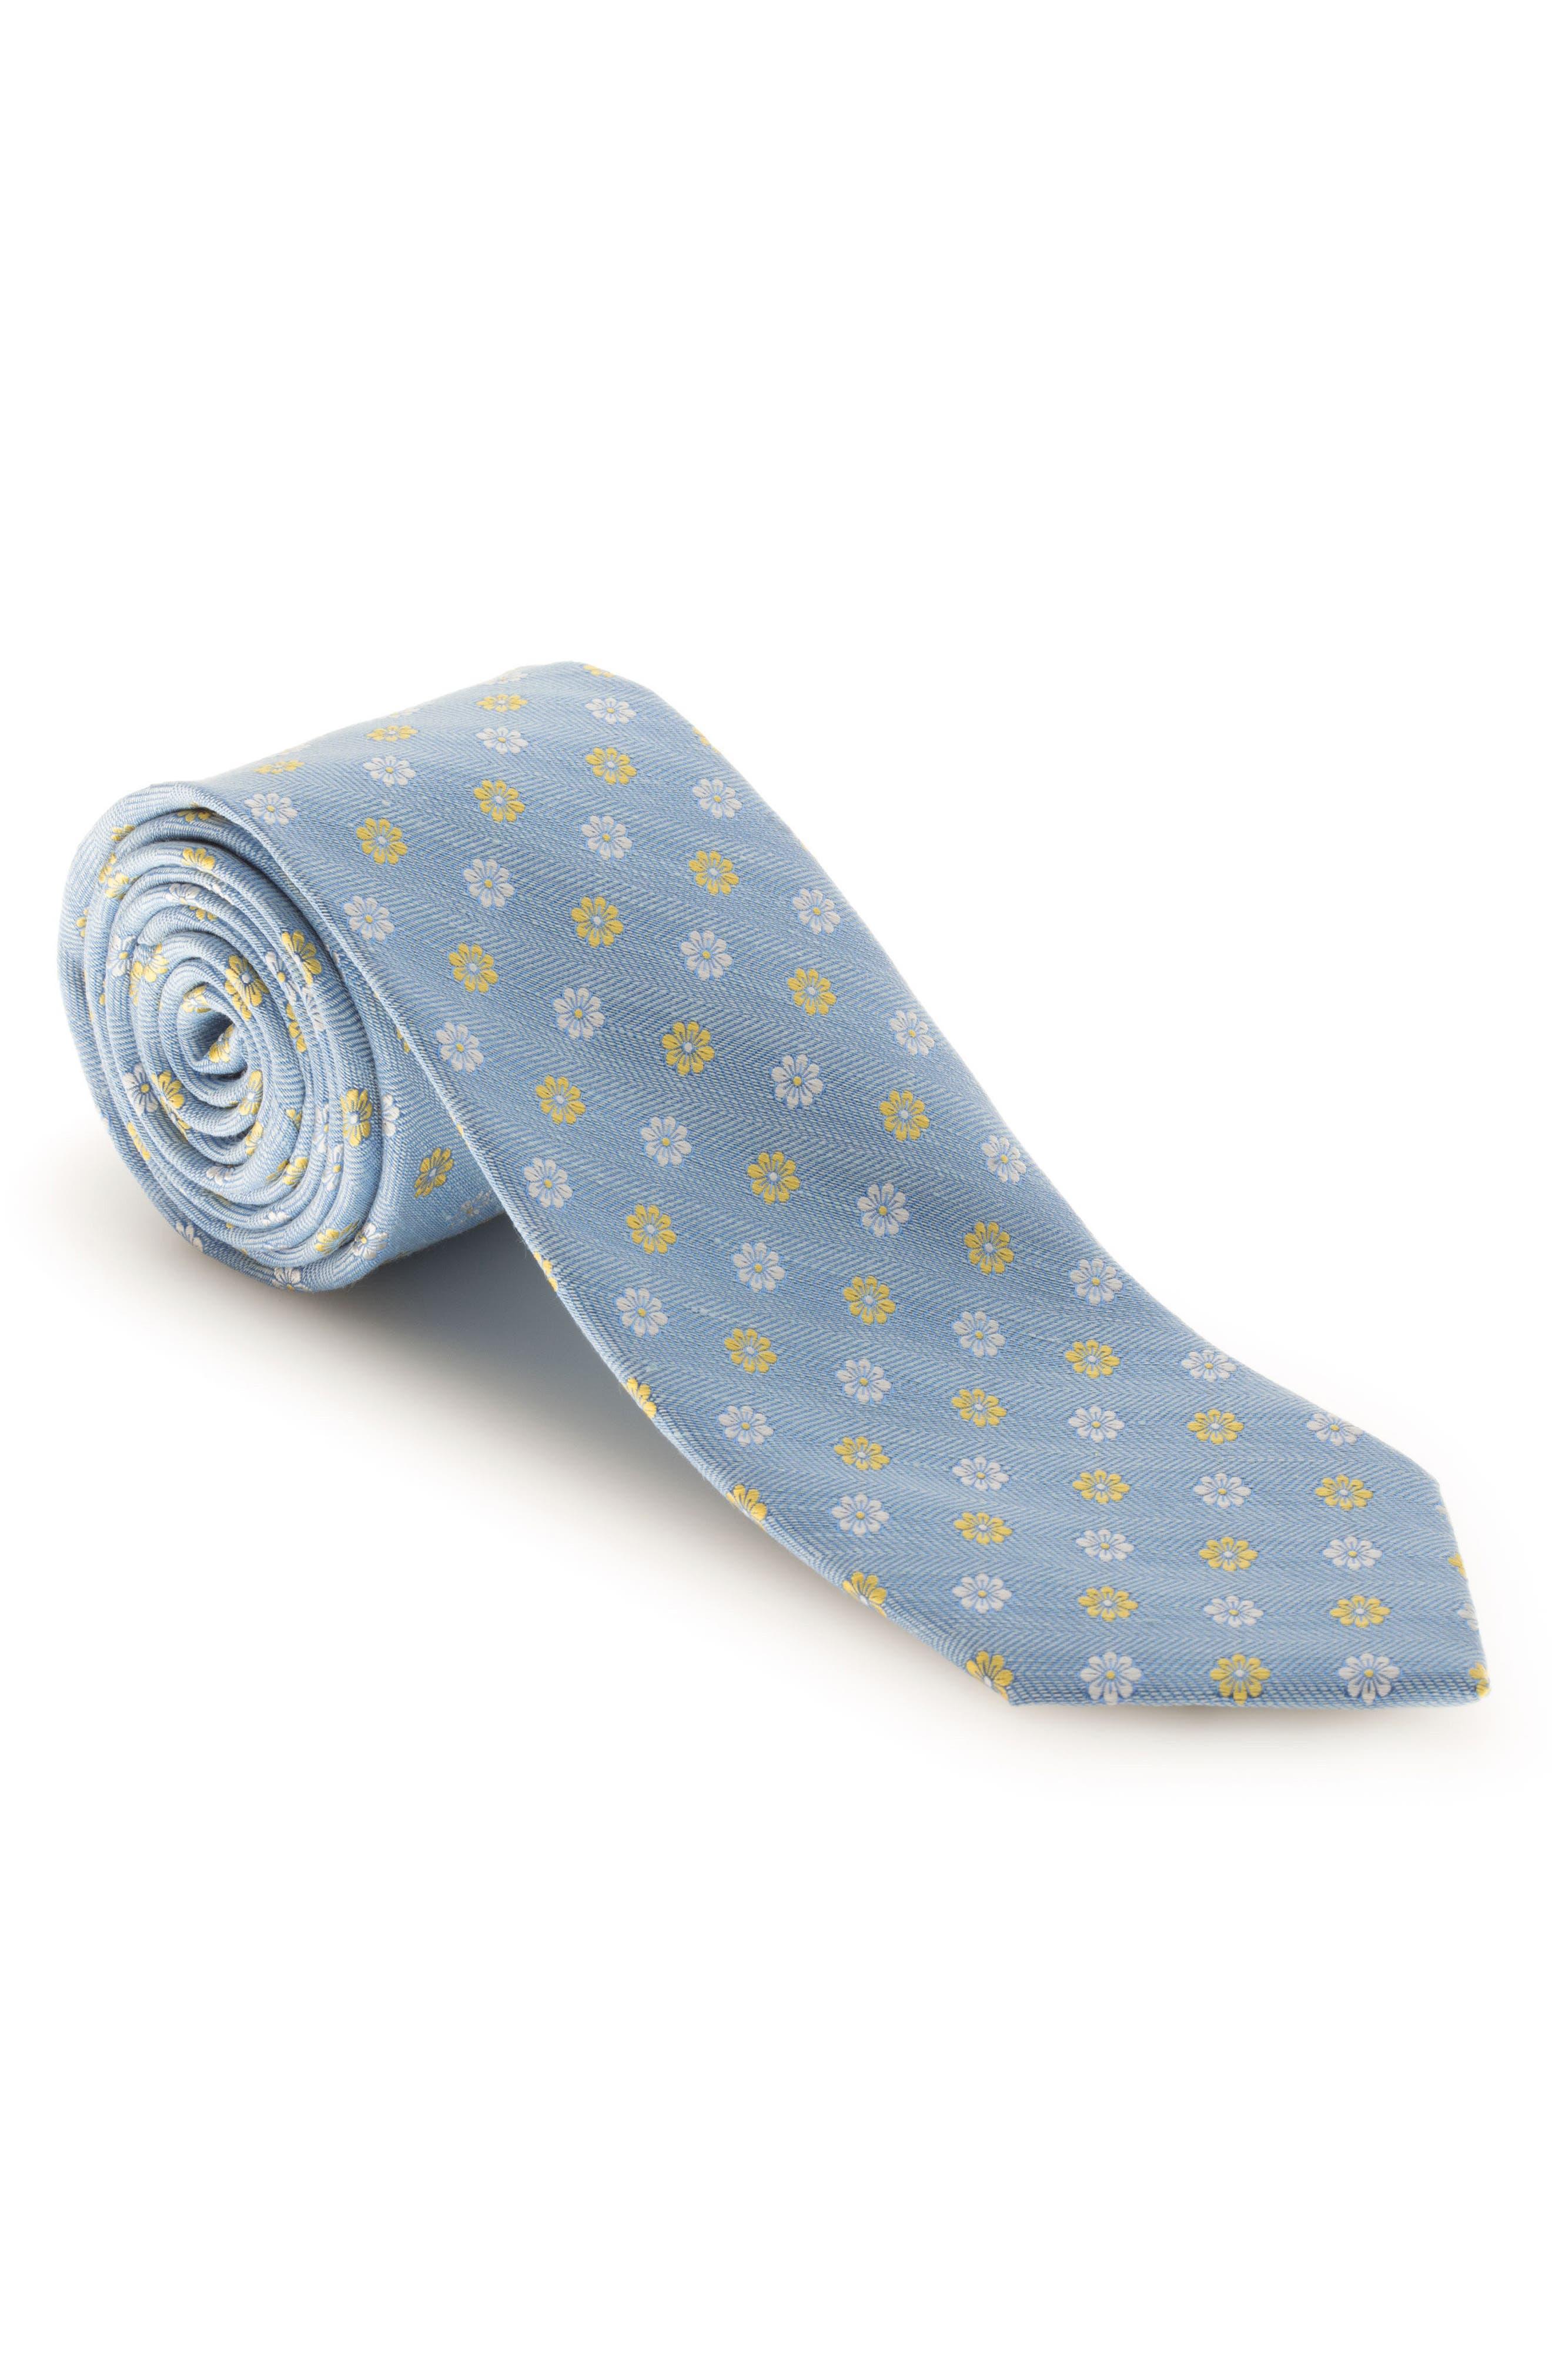 Main Image - Robert Talbott Floral Silk & Linen Tie